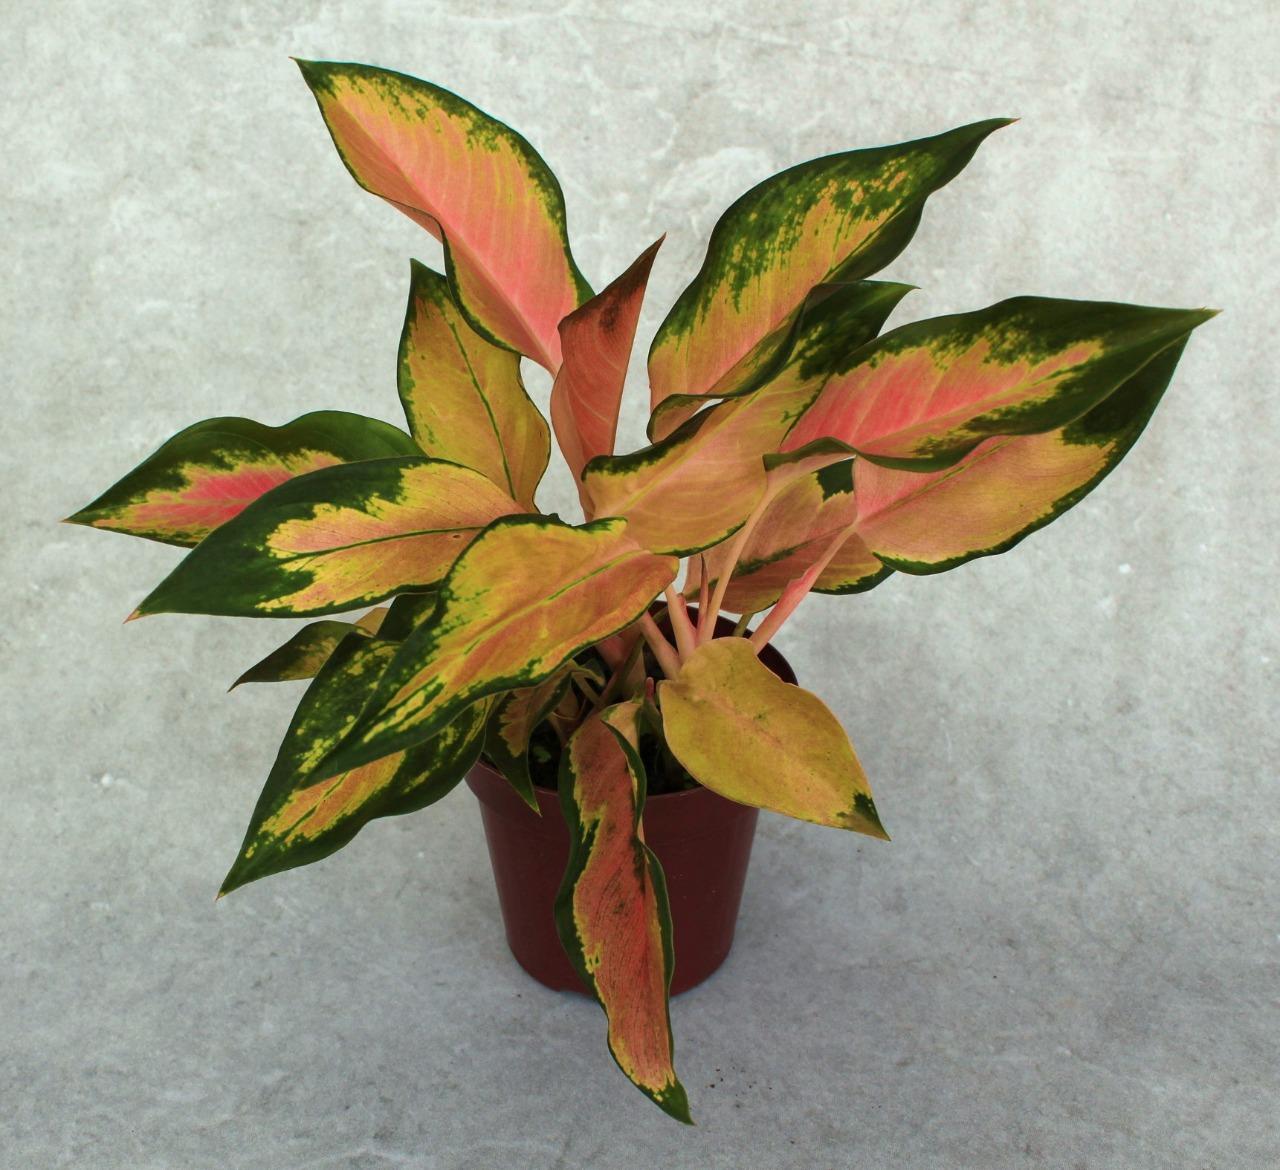 Aglaonema Lawan - Pote 12 (Aglaonema spp)